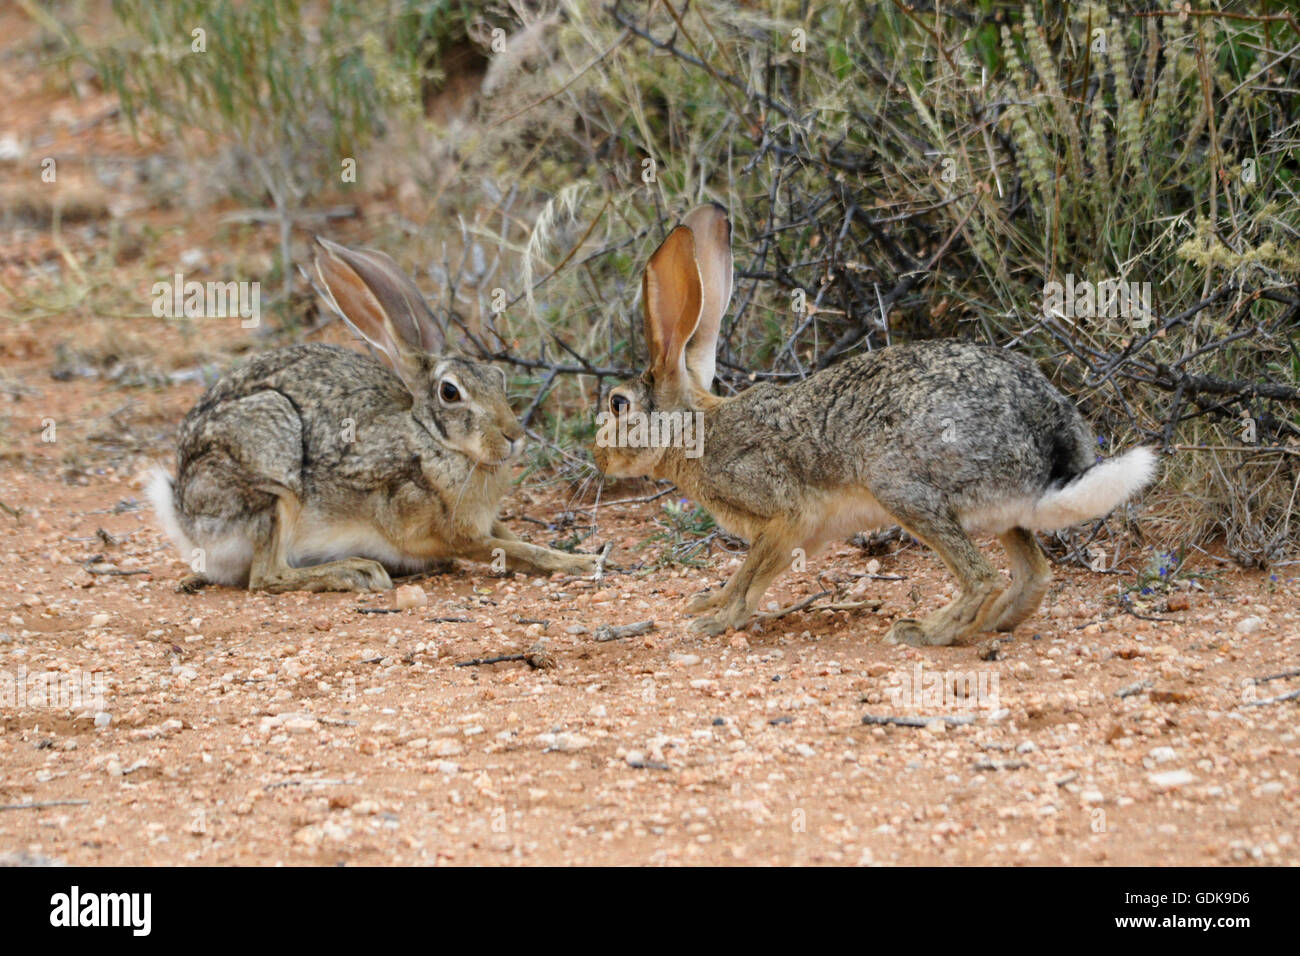 African hares (Cape hares) courting, Samburu Game Reserve, Kenya - Stock Image